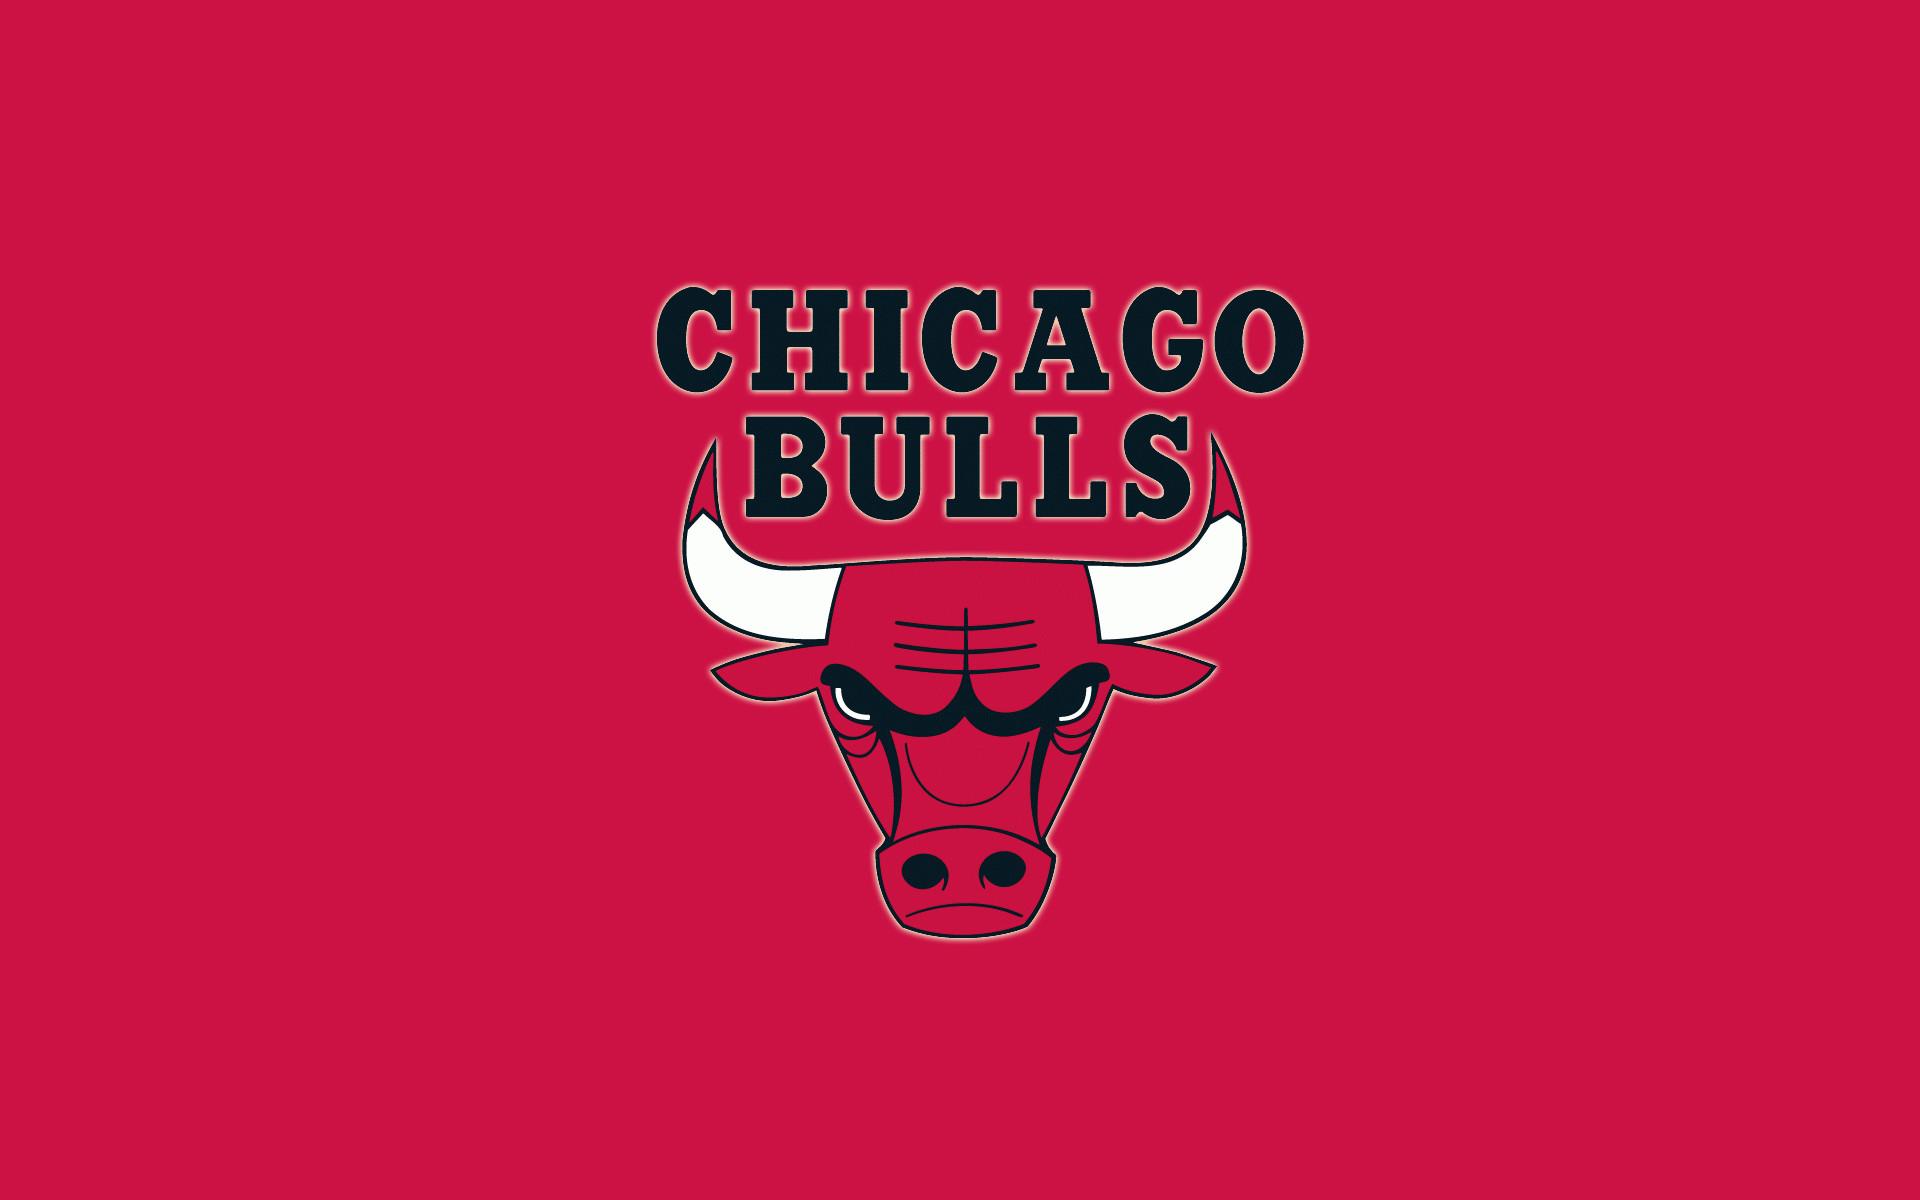 Free Chicago Bulls Logo Wallpapers Download.